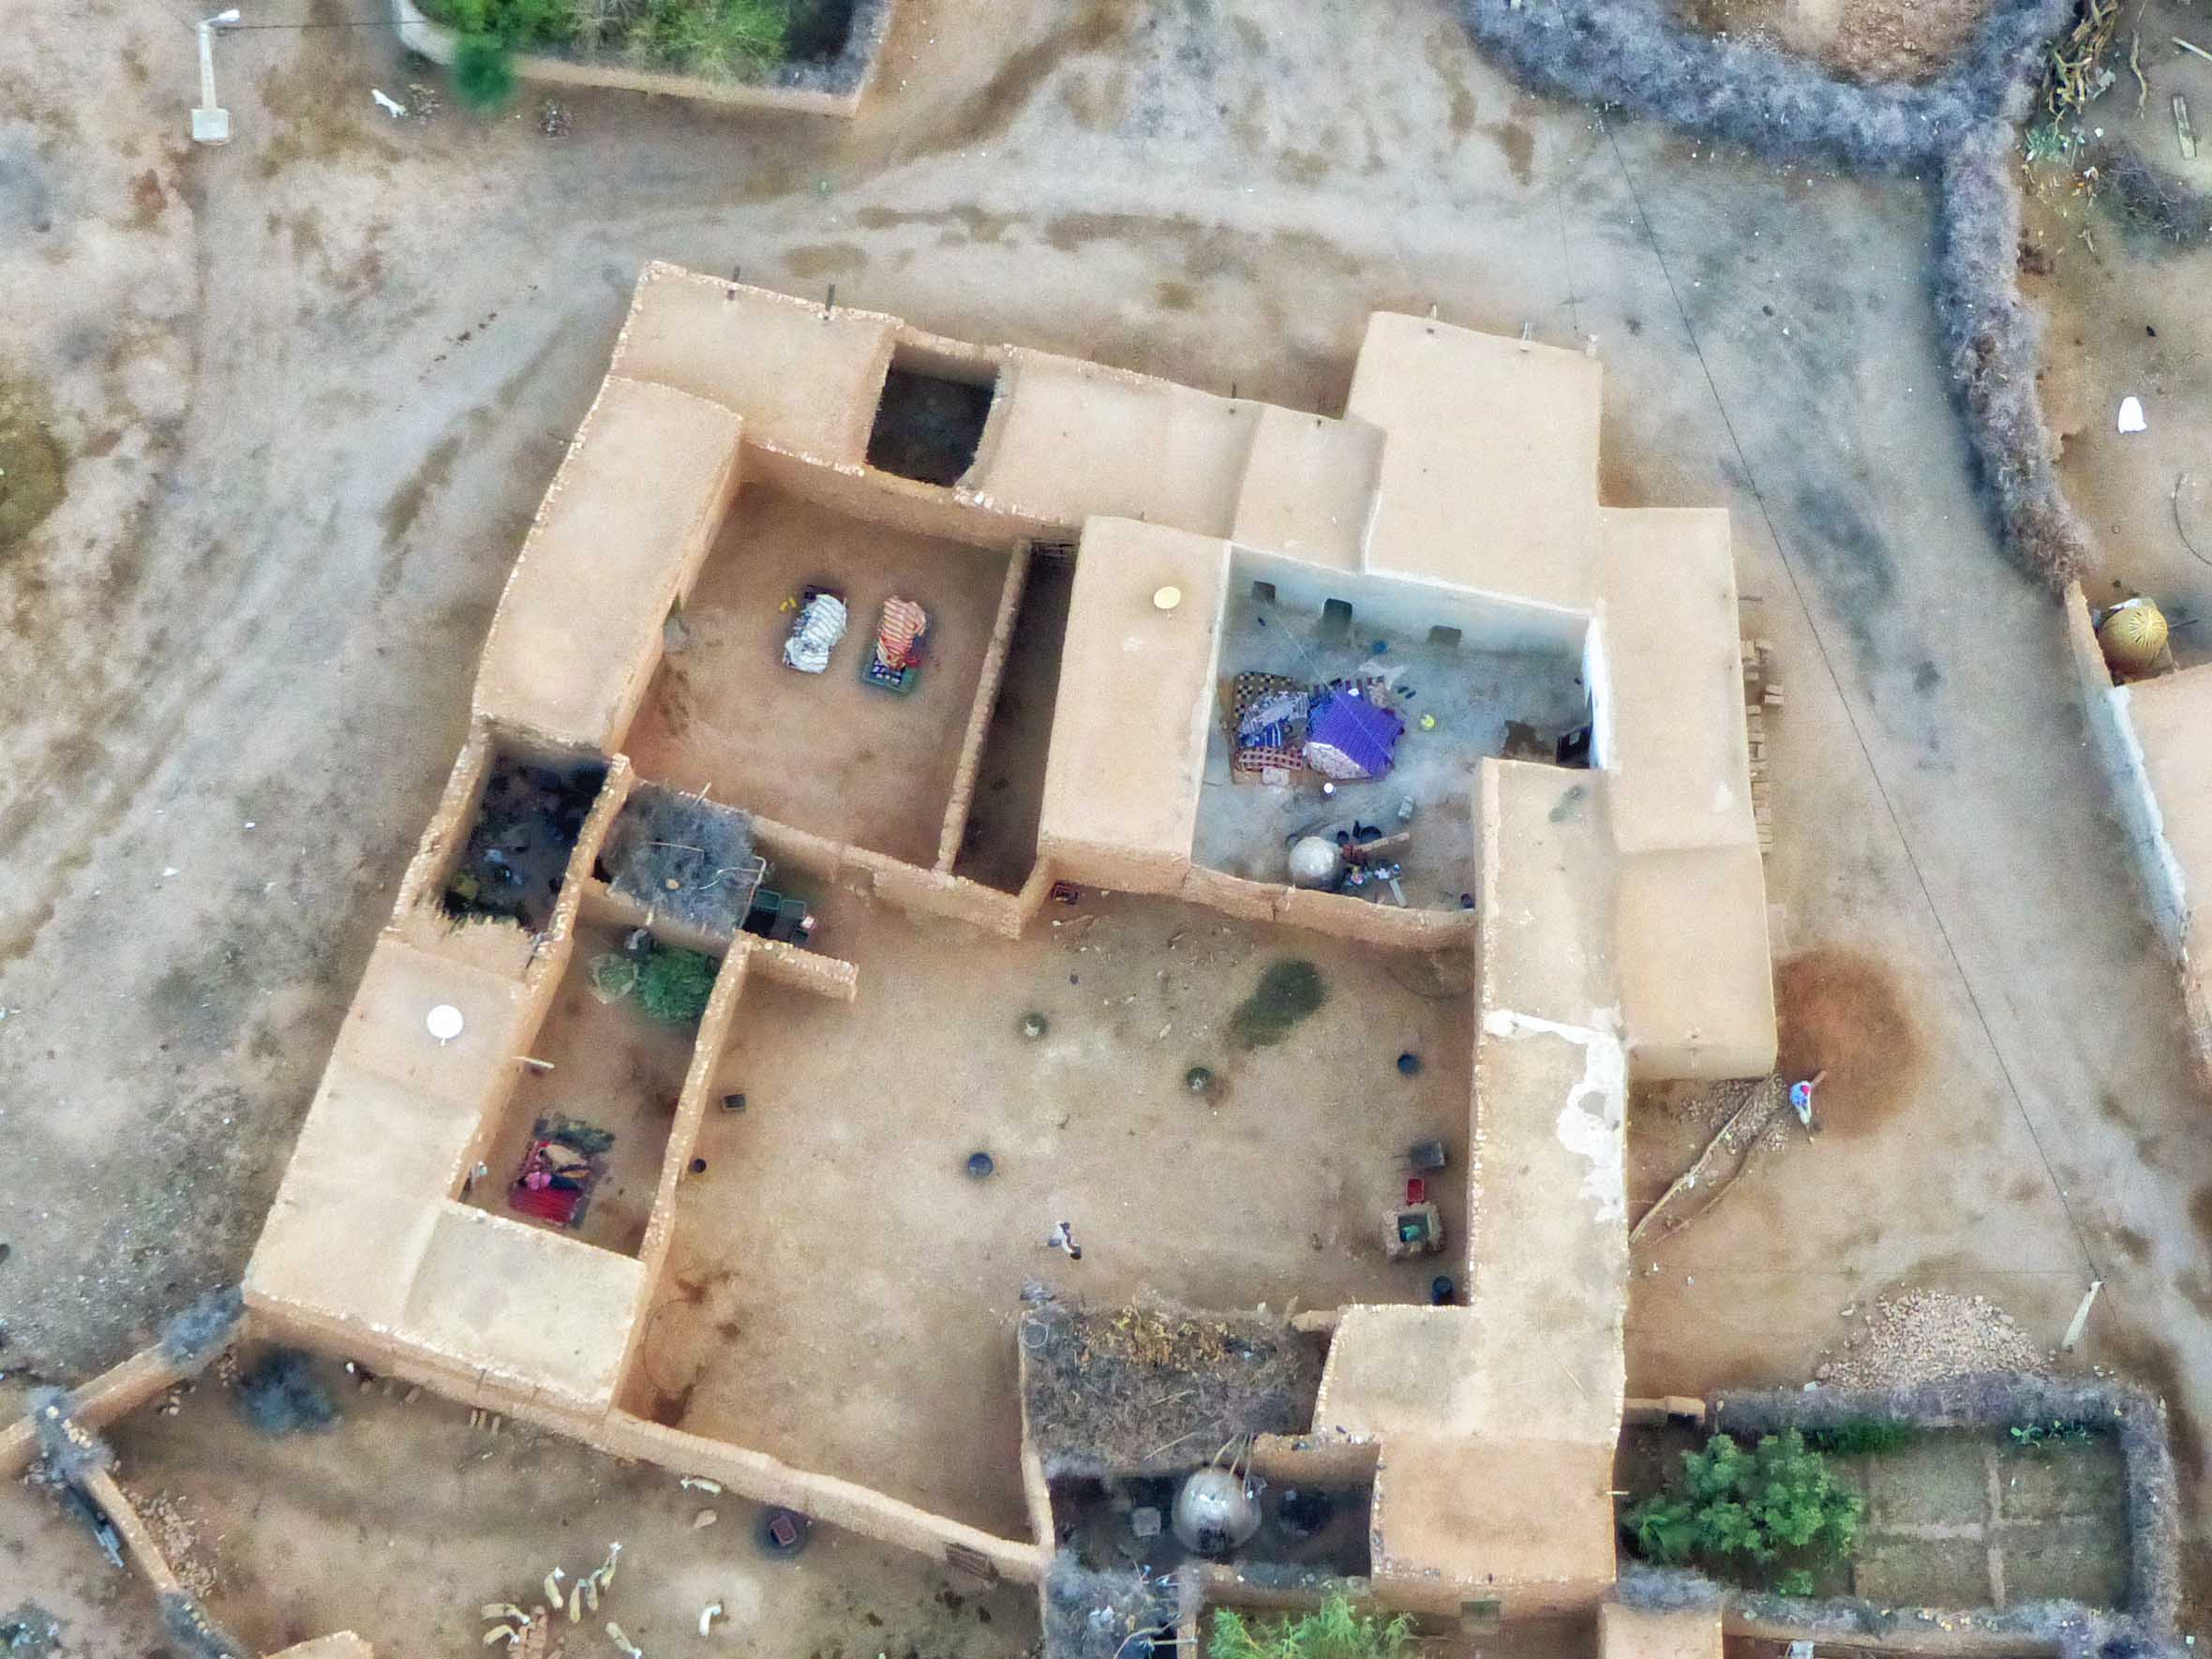 Aerial view of desert village home